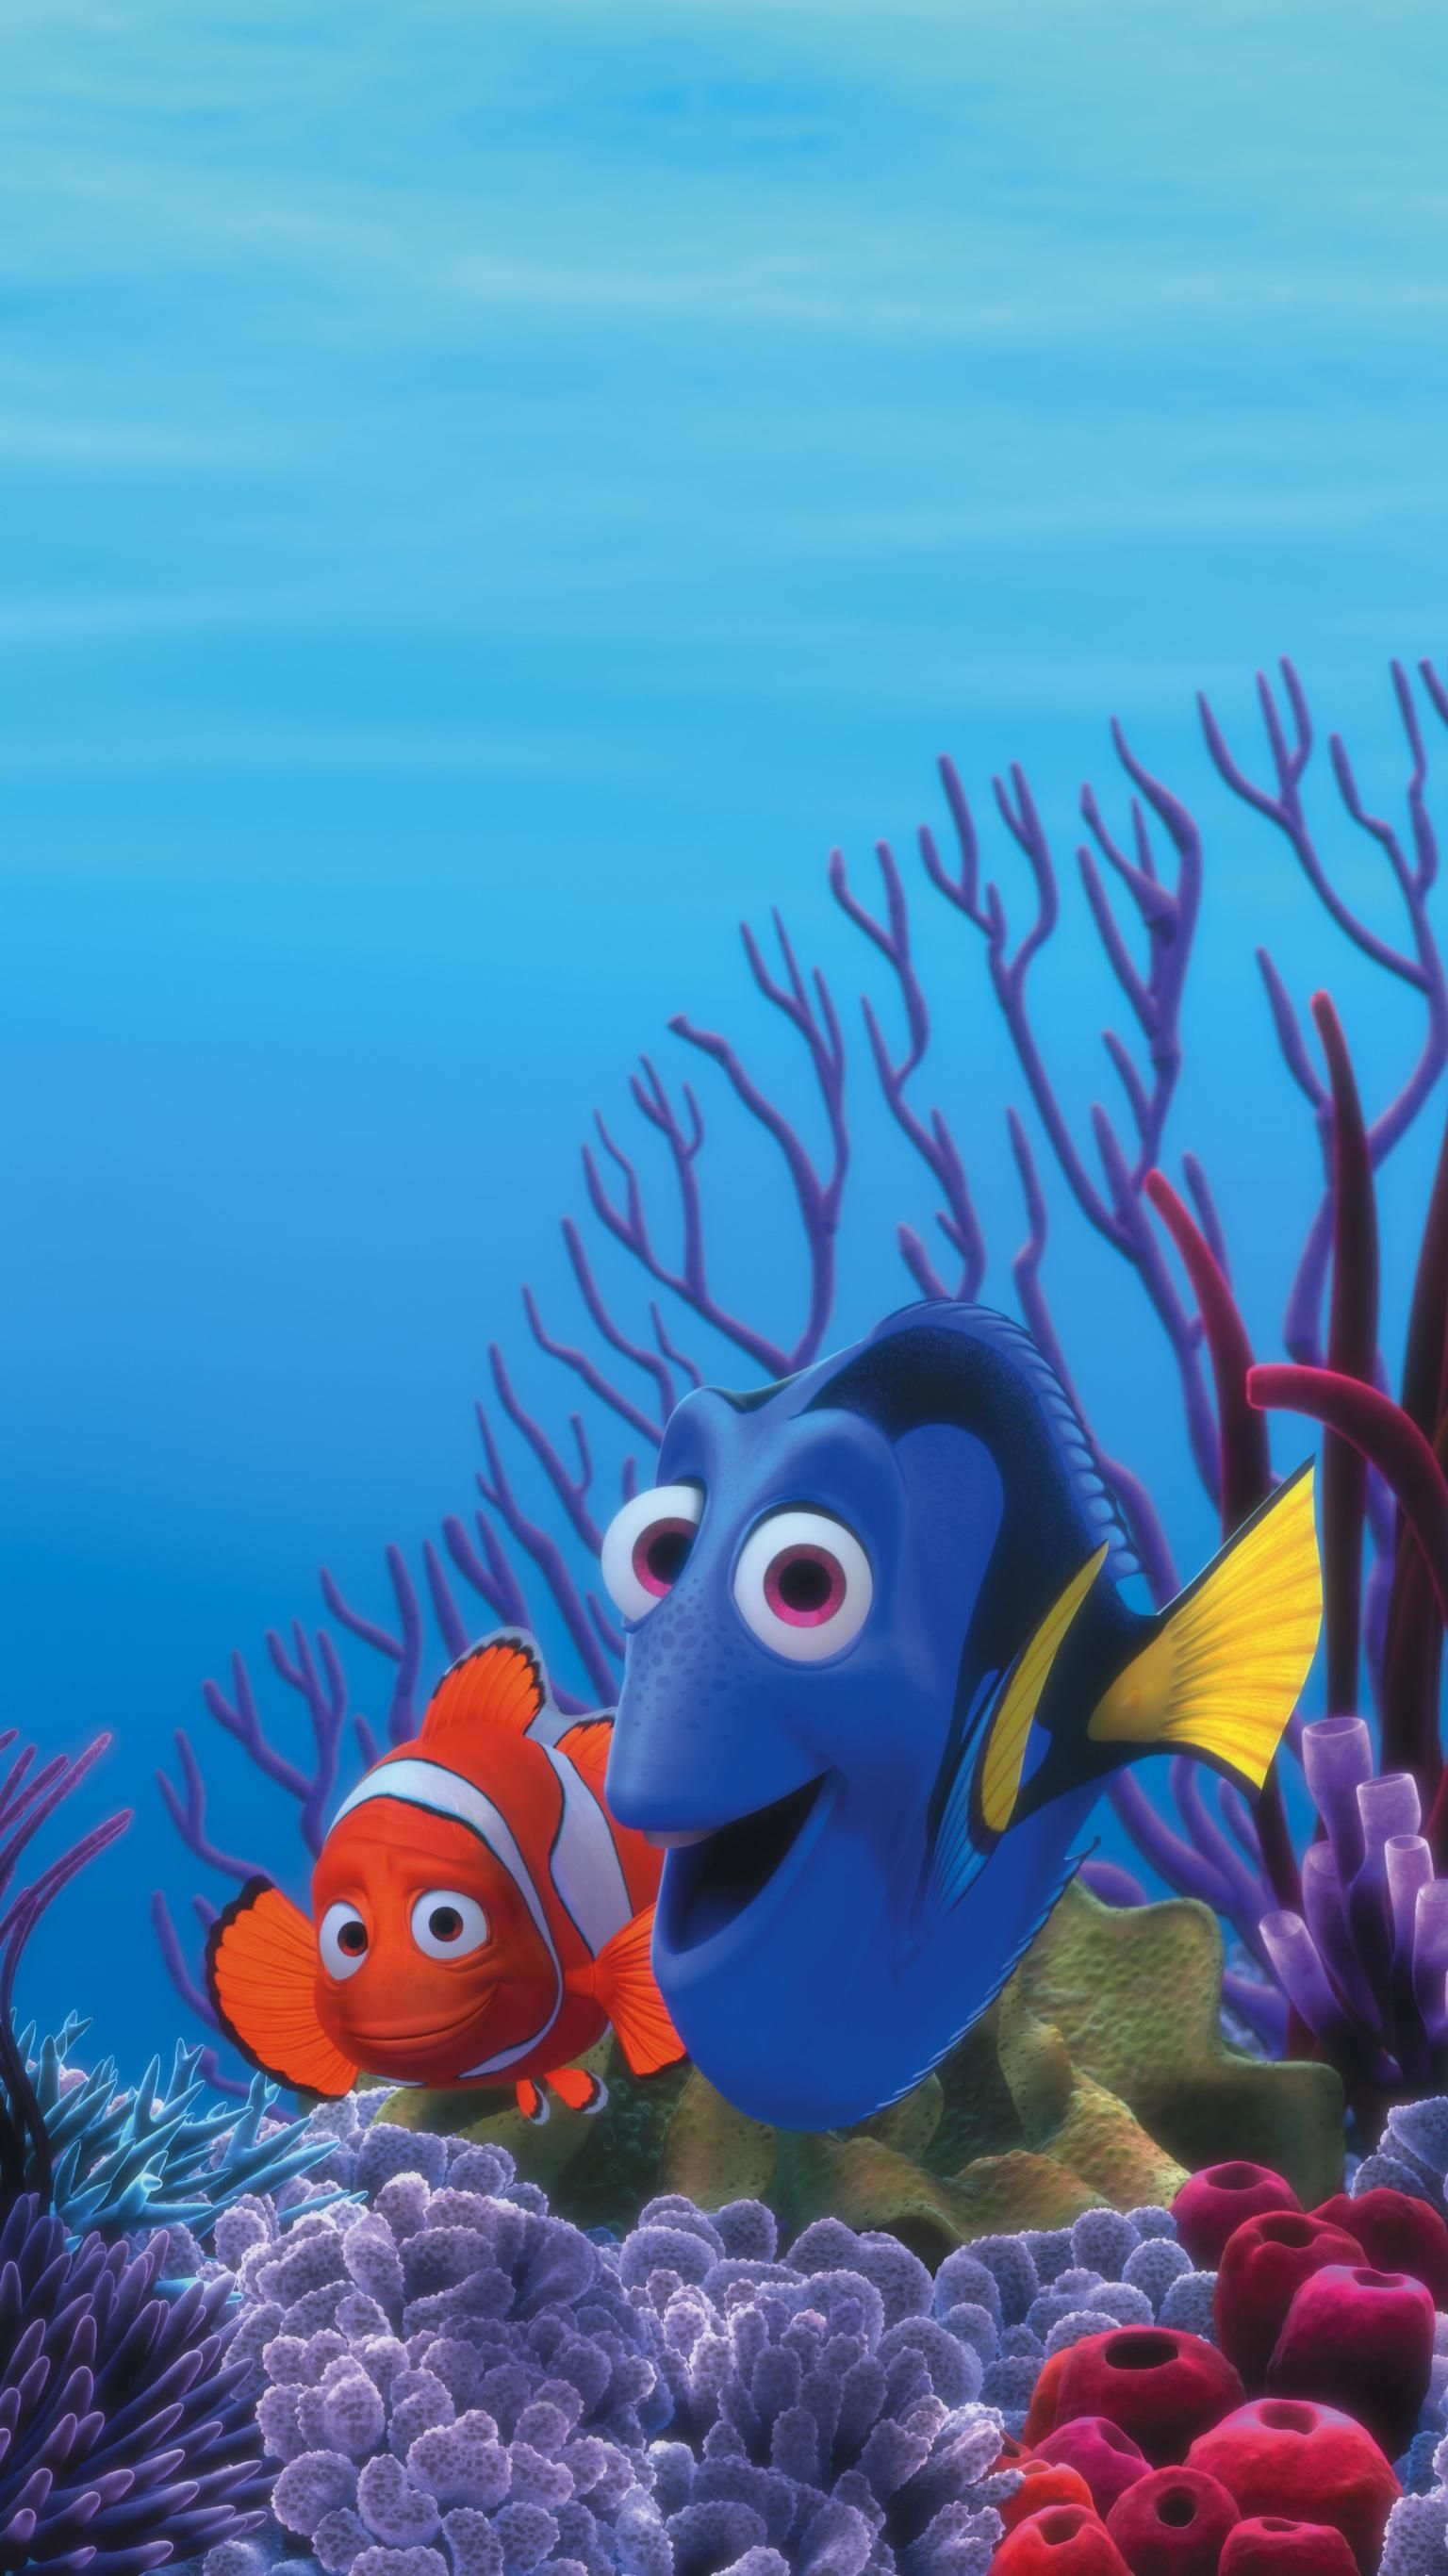 Finding Nemo 2003 Phone Wallpaper Moviemania Disney Wallpaper Disney Finding Nemo Cute Disney Wallpaper